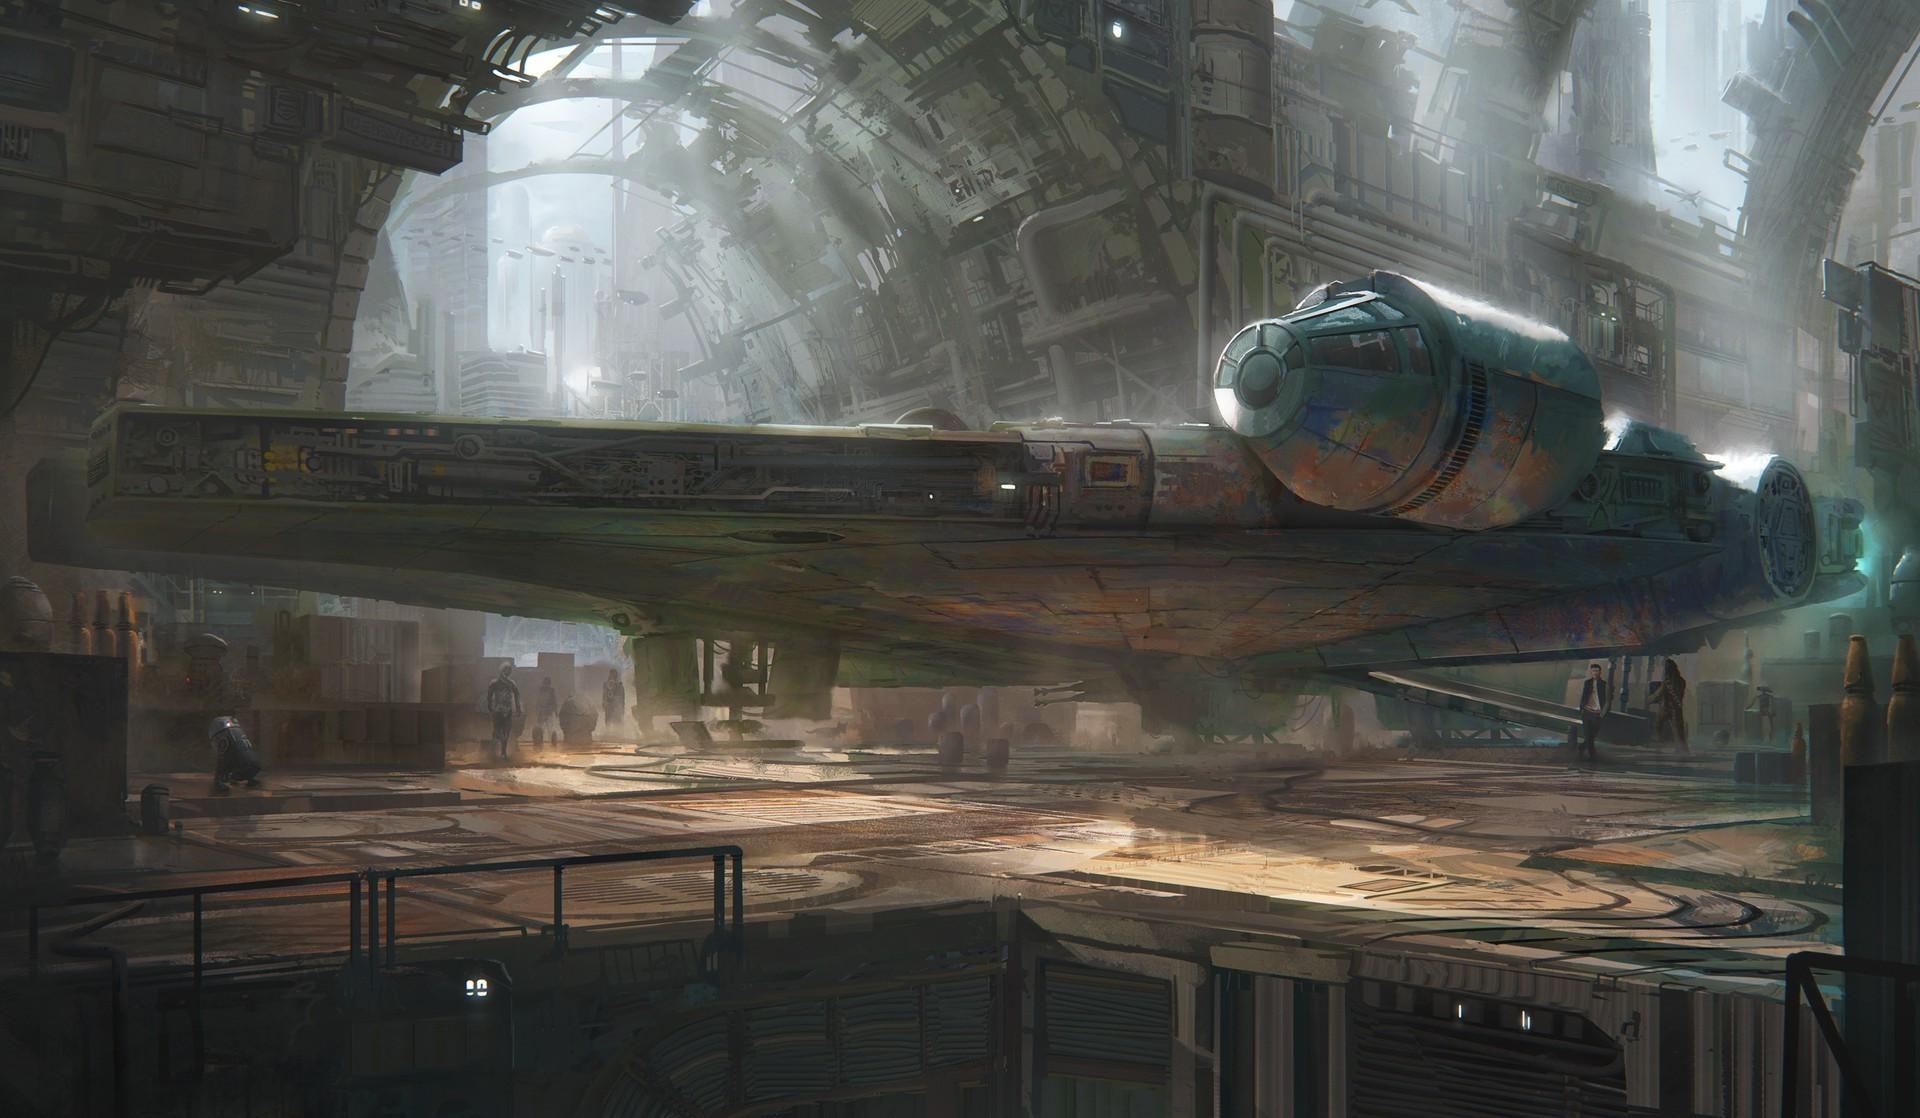 artwork, Science Fiction, Star Wars, Millennium Falcon Wallpapers HD /  Desktop and Mobile Backgrounds